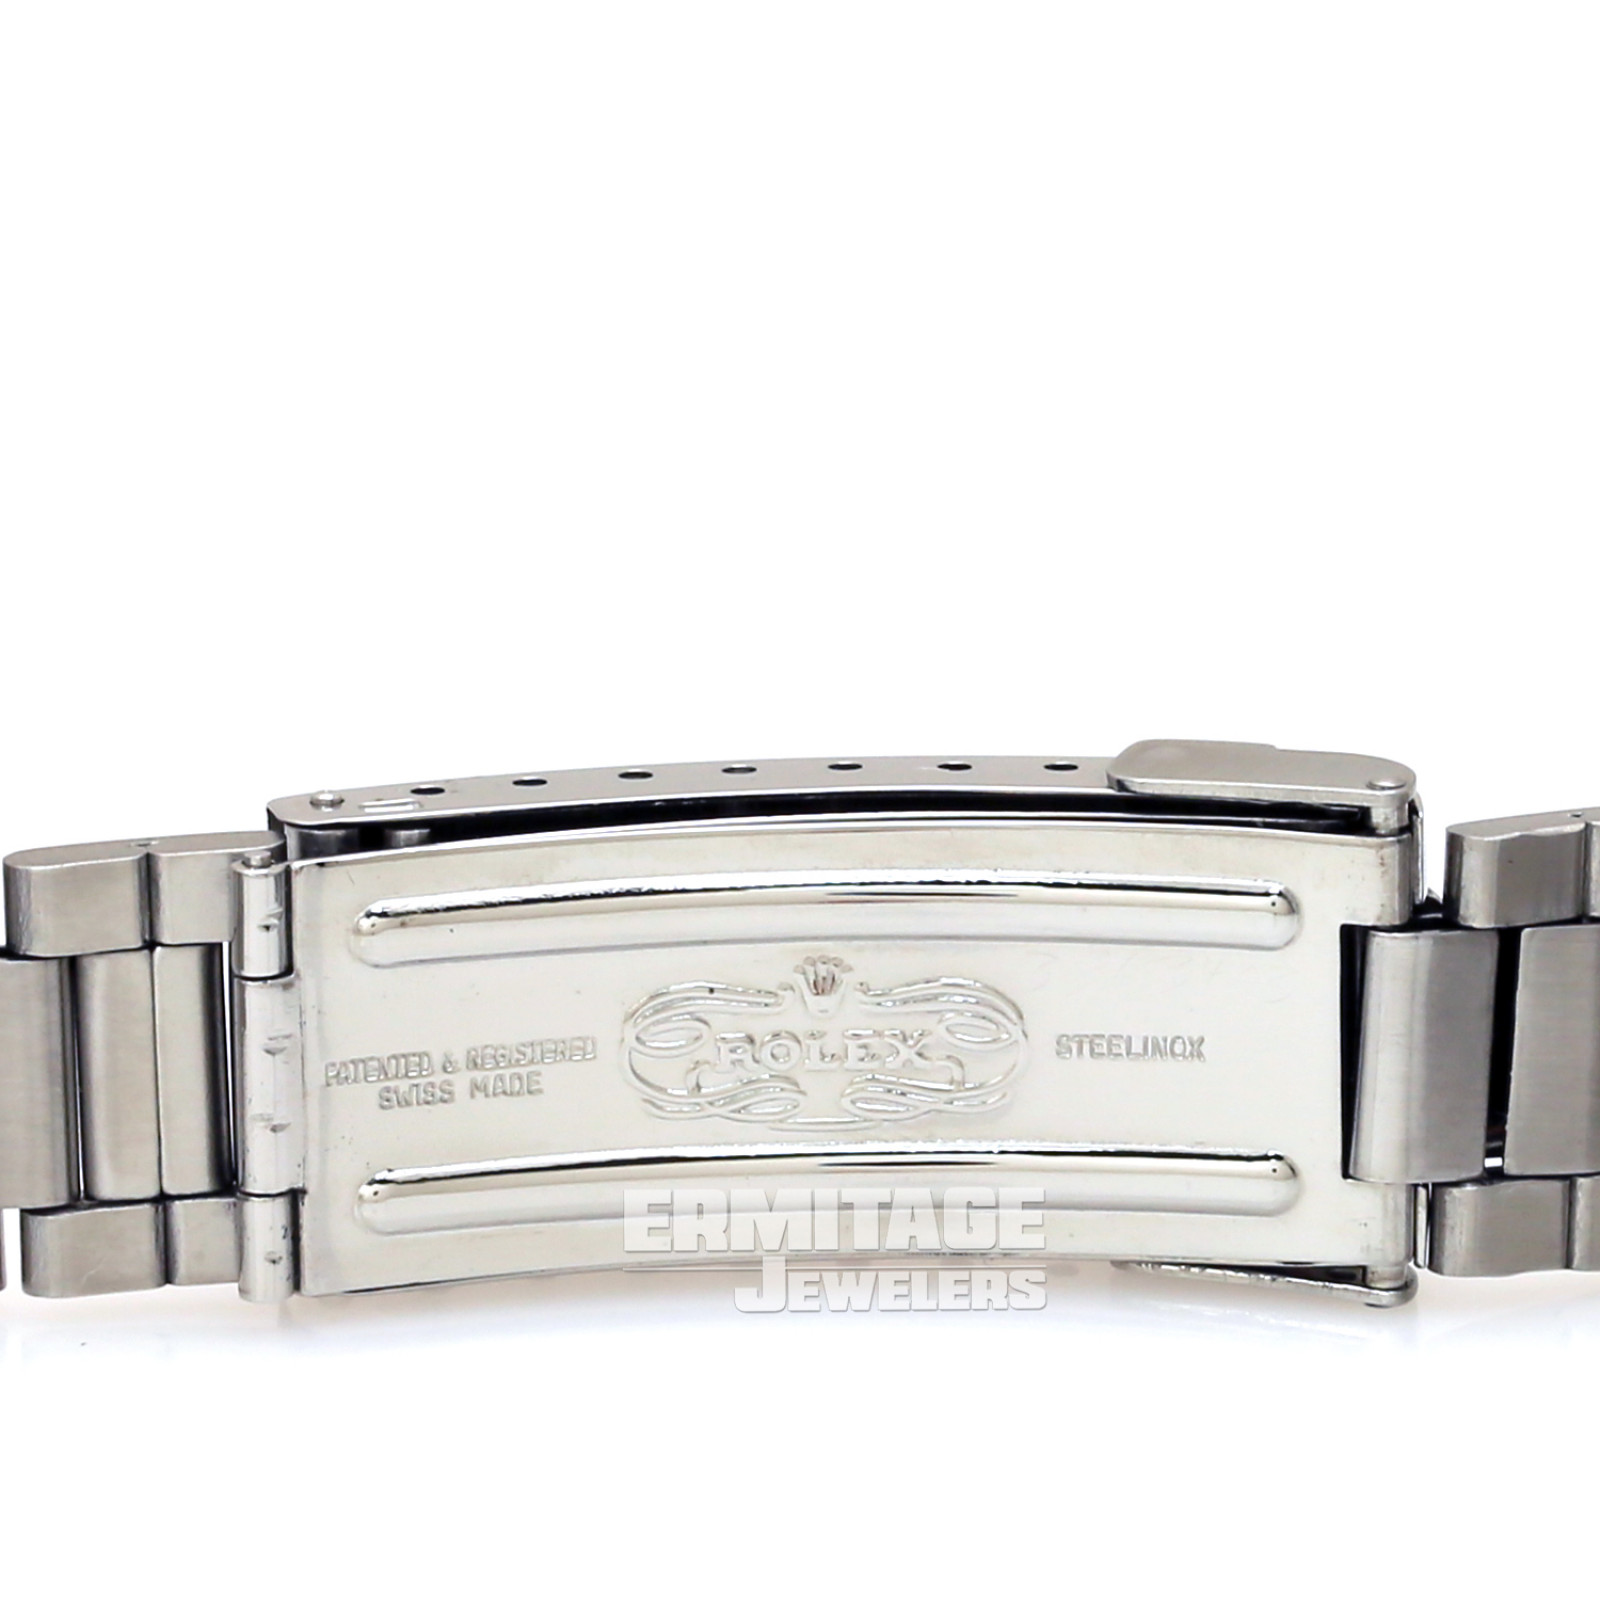 Steel on Oyster Rolex Submariner 5513 40 mm